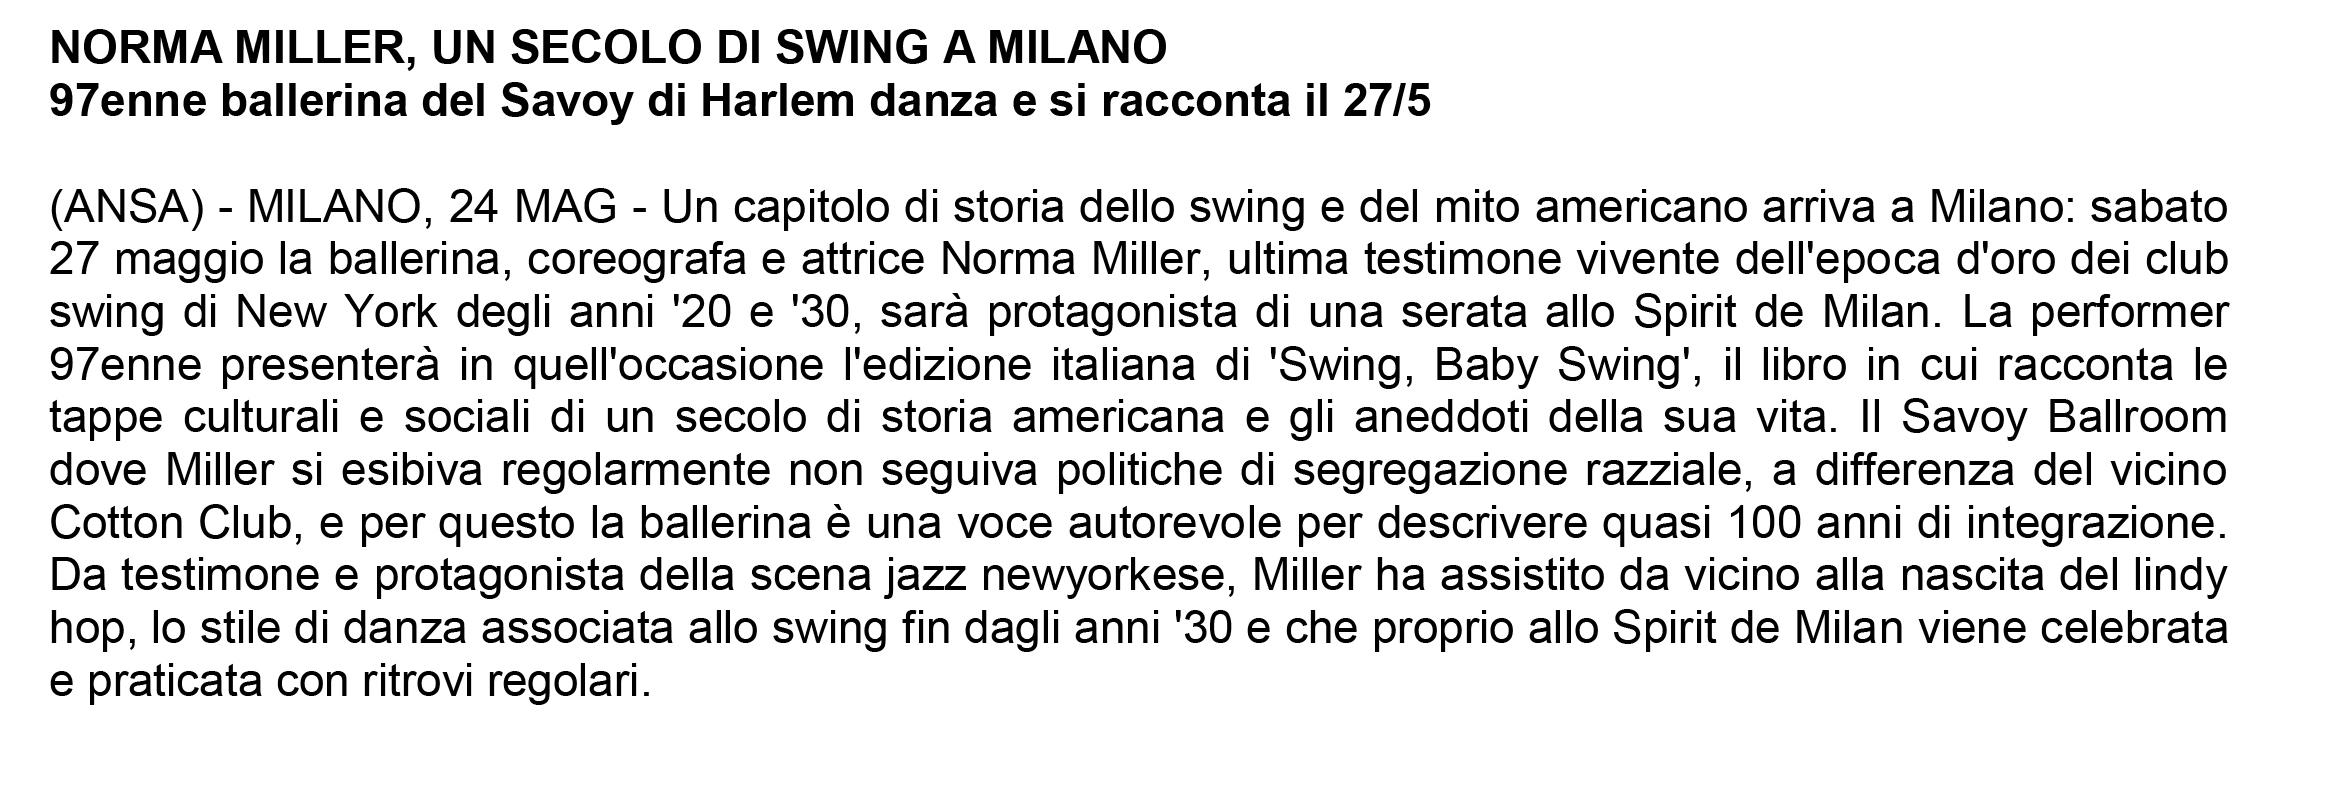 NORMA MILLER, un secolo di swing a milano 24/05